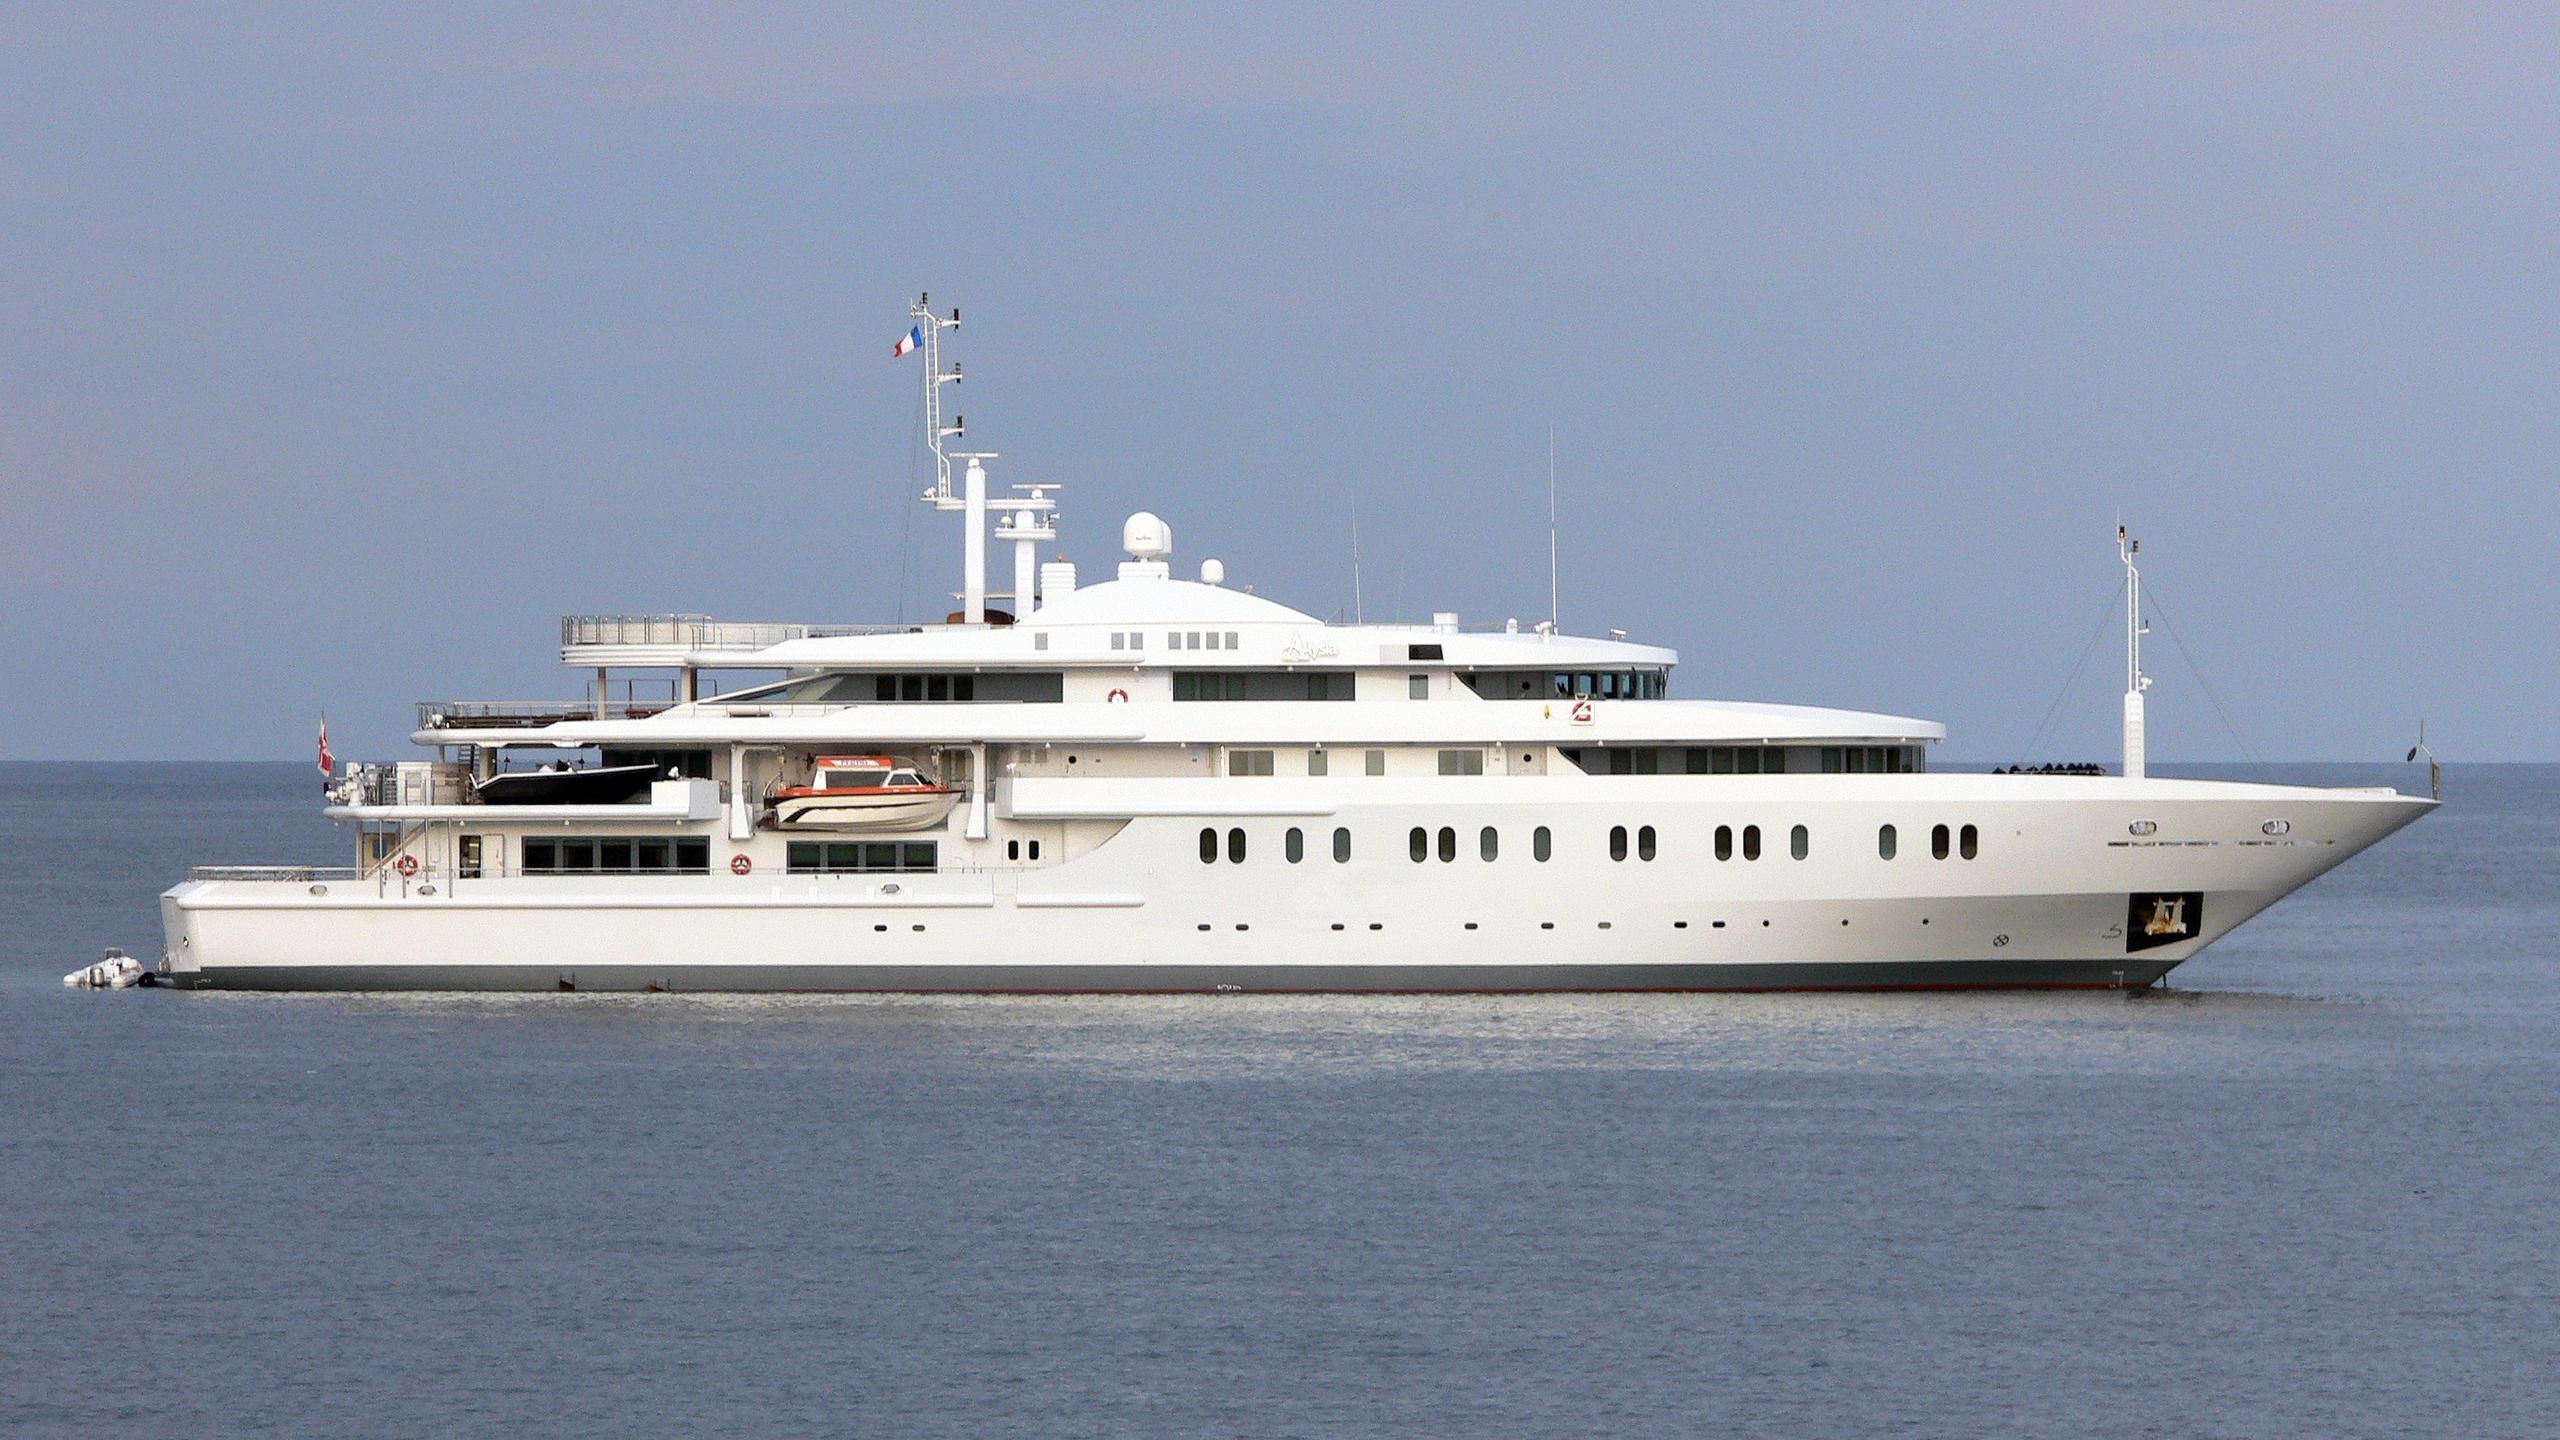 moonlight-ii-motor-yacht-neorion-2005-91m-profile-before-refit